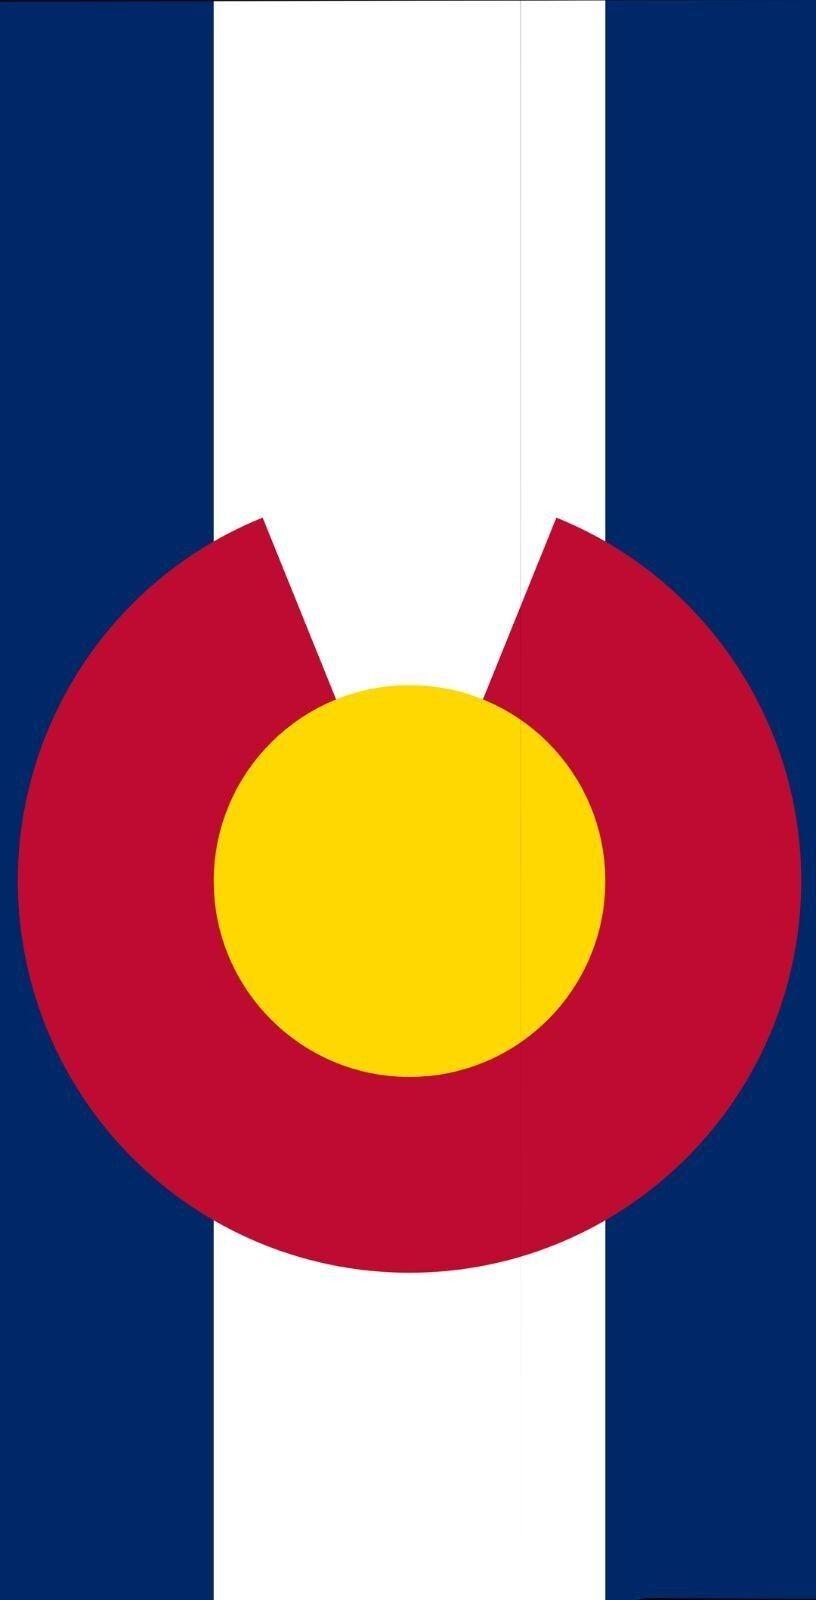 colorado  State Flag Themed Cornhole Board Prints   Wraps   Corn Hole  high quality genuine